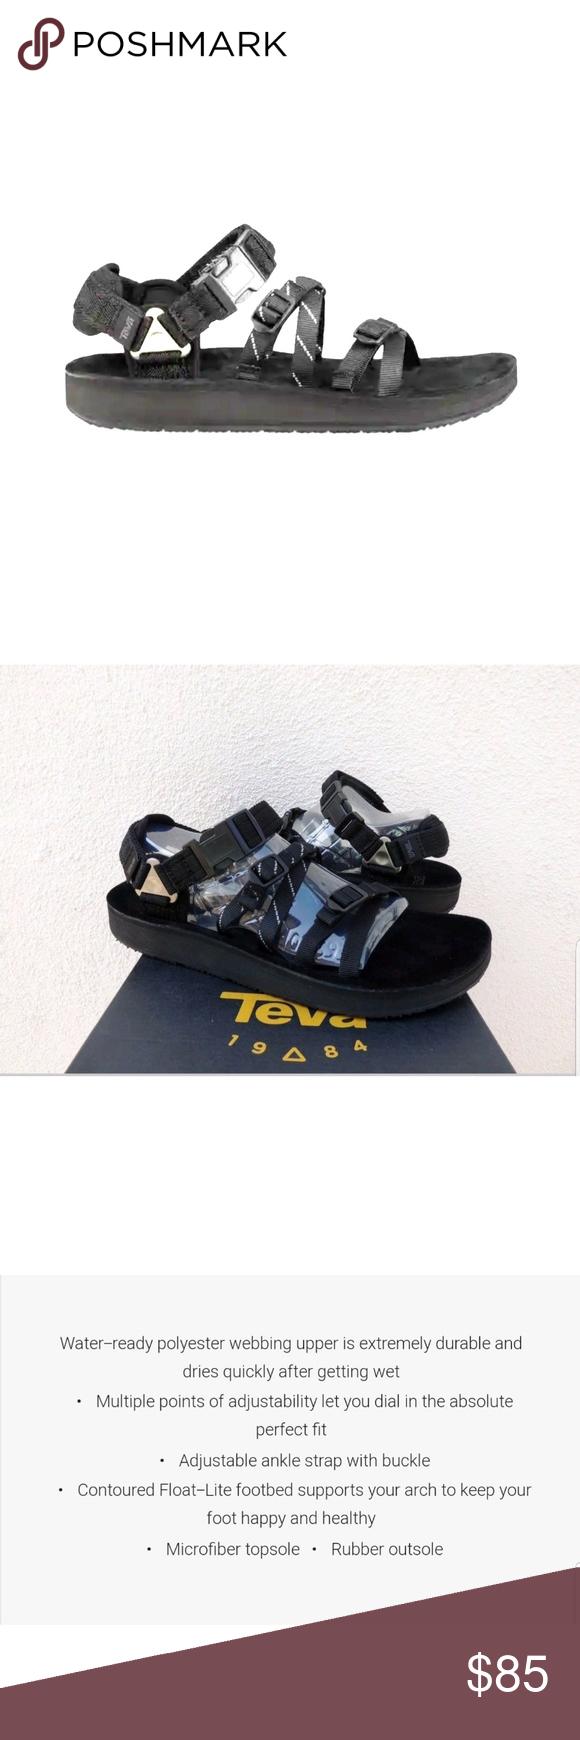 844de80a4c7 💥Winter Sale💥 Teva Emmi Sandal. 🌟Brand new in box 🌟W Alp Premier Emmi  Sandal 🌟Color is black 🌟Size 8 Teva Shoes Sandals